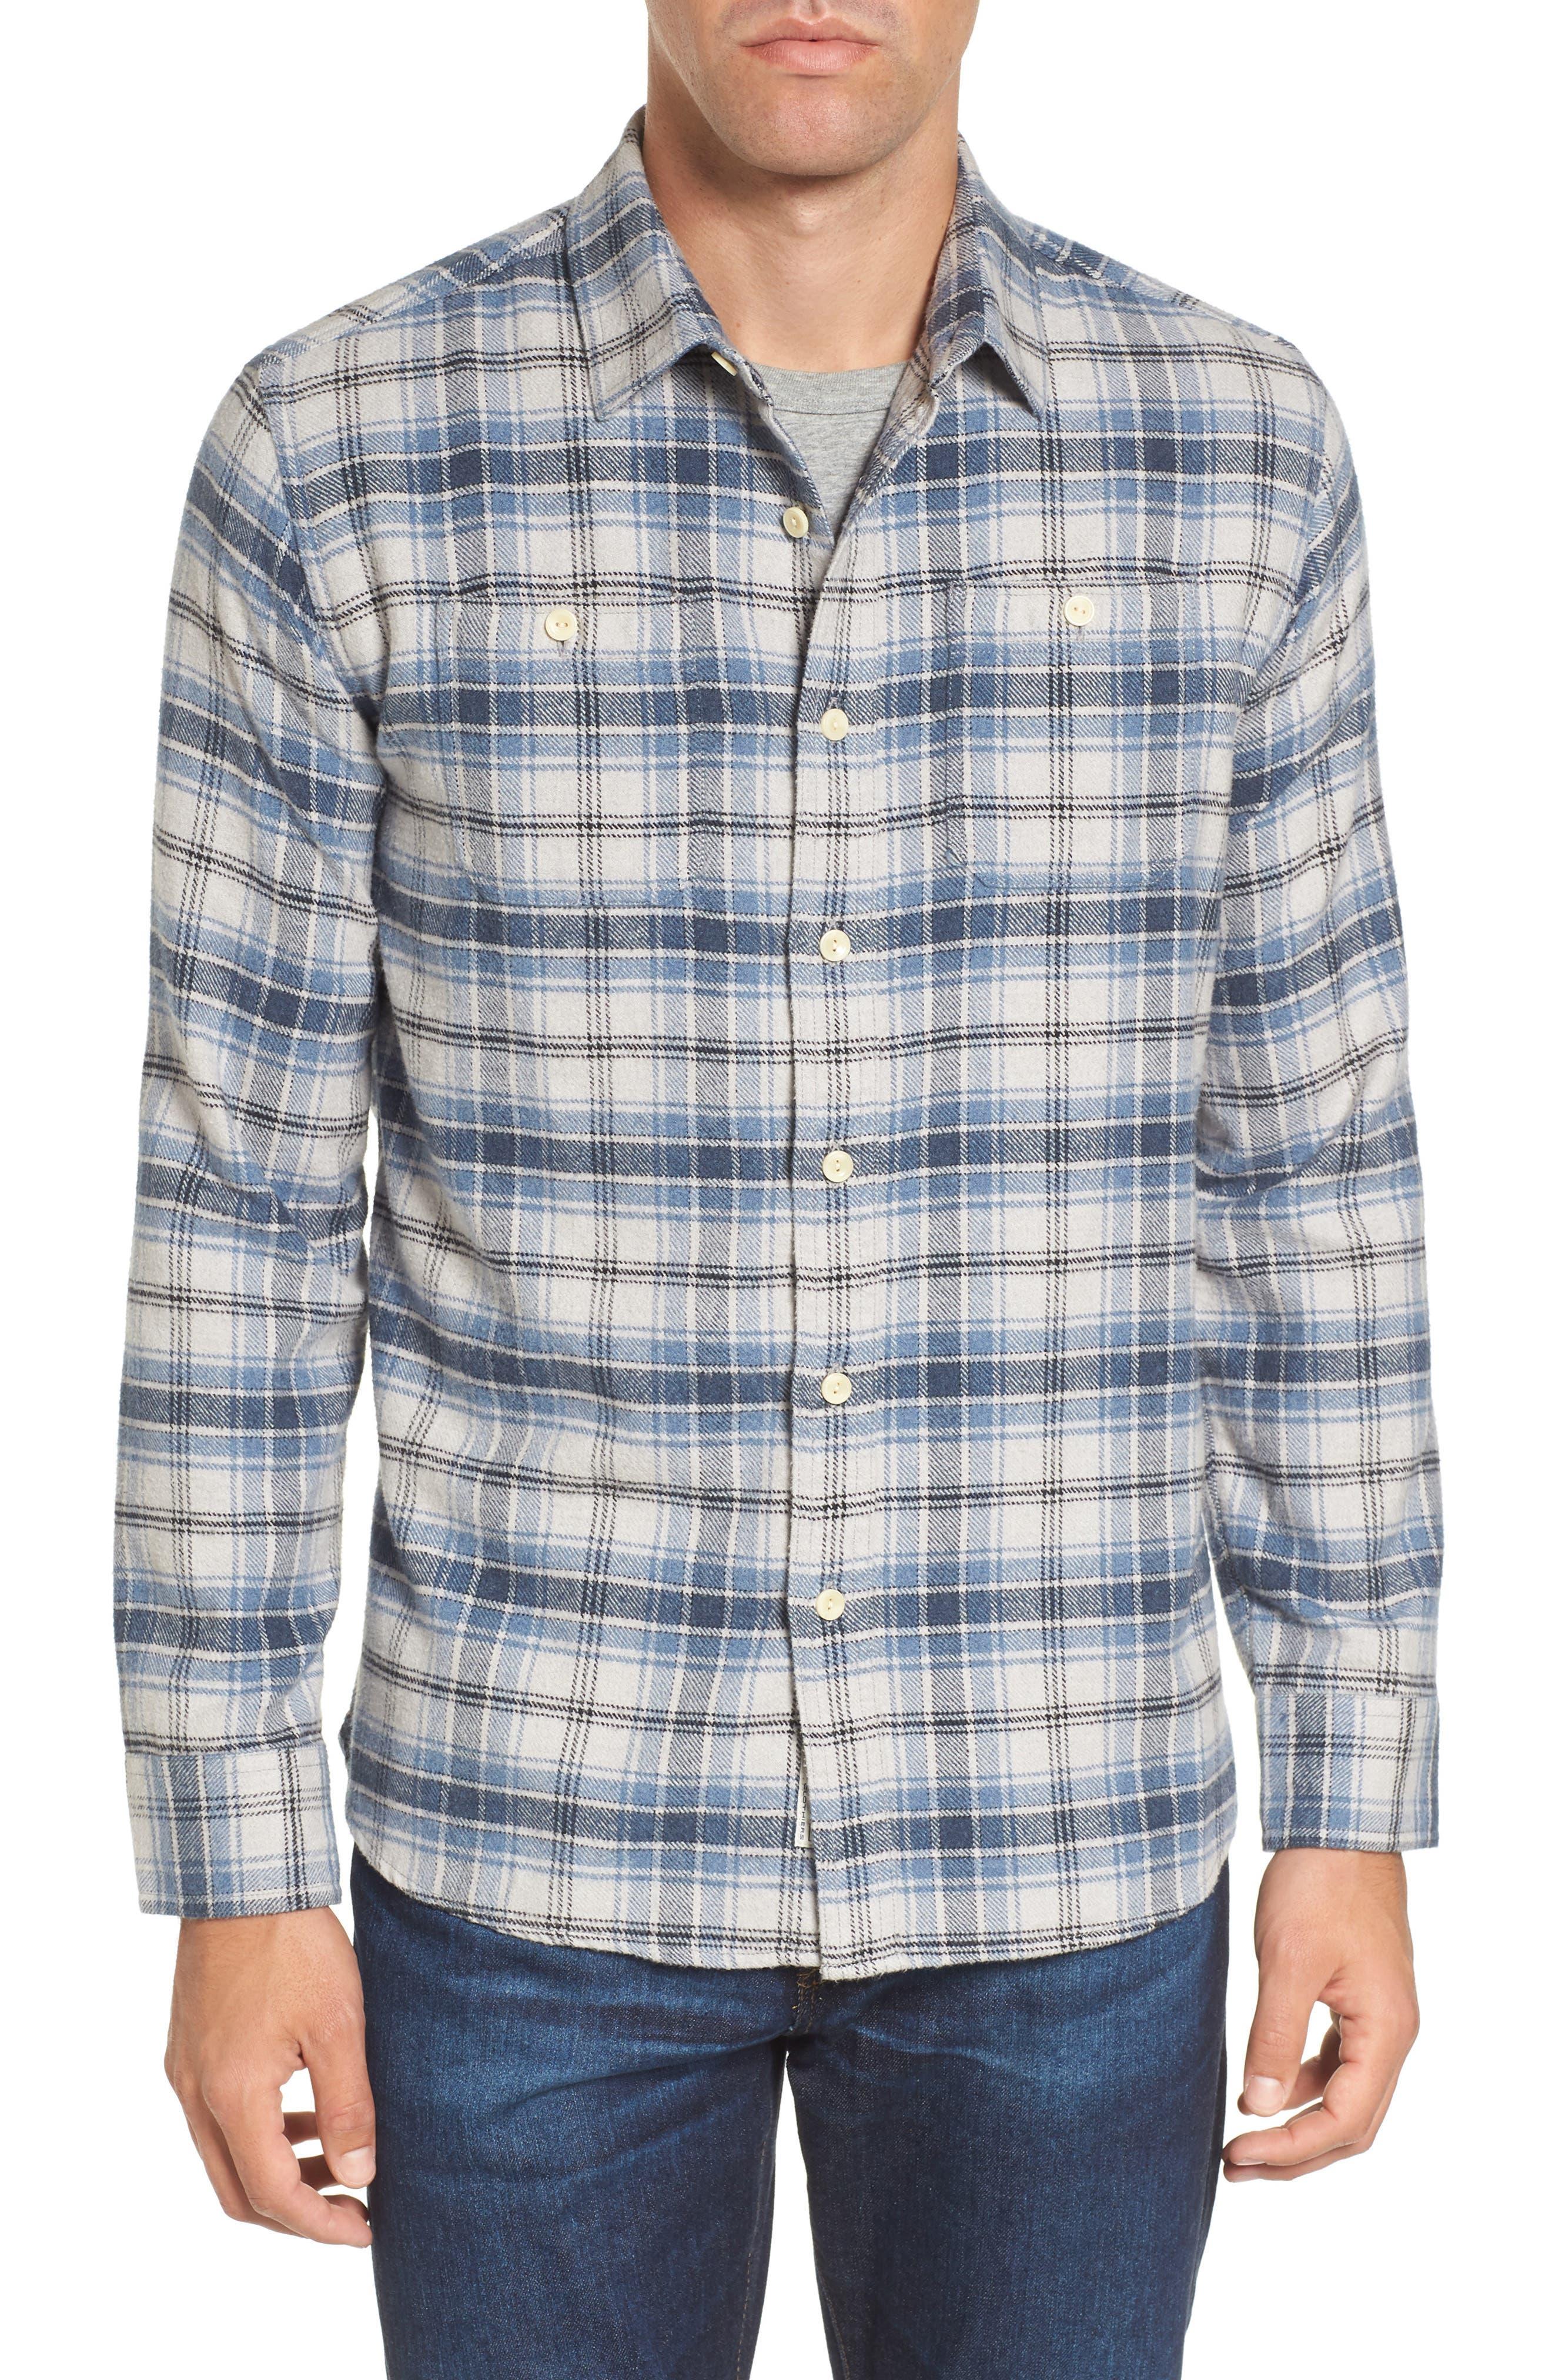 Campton Heritage Plaid Flannel Shirt,                         Main,                         color, Blue Stone